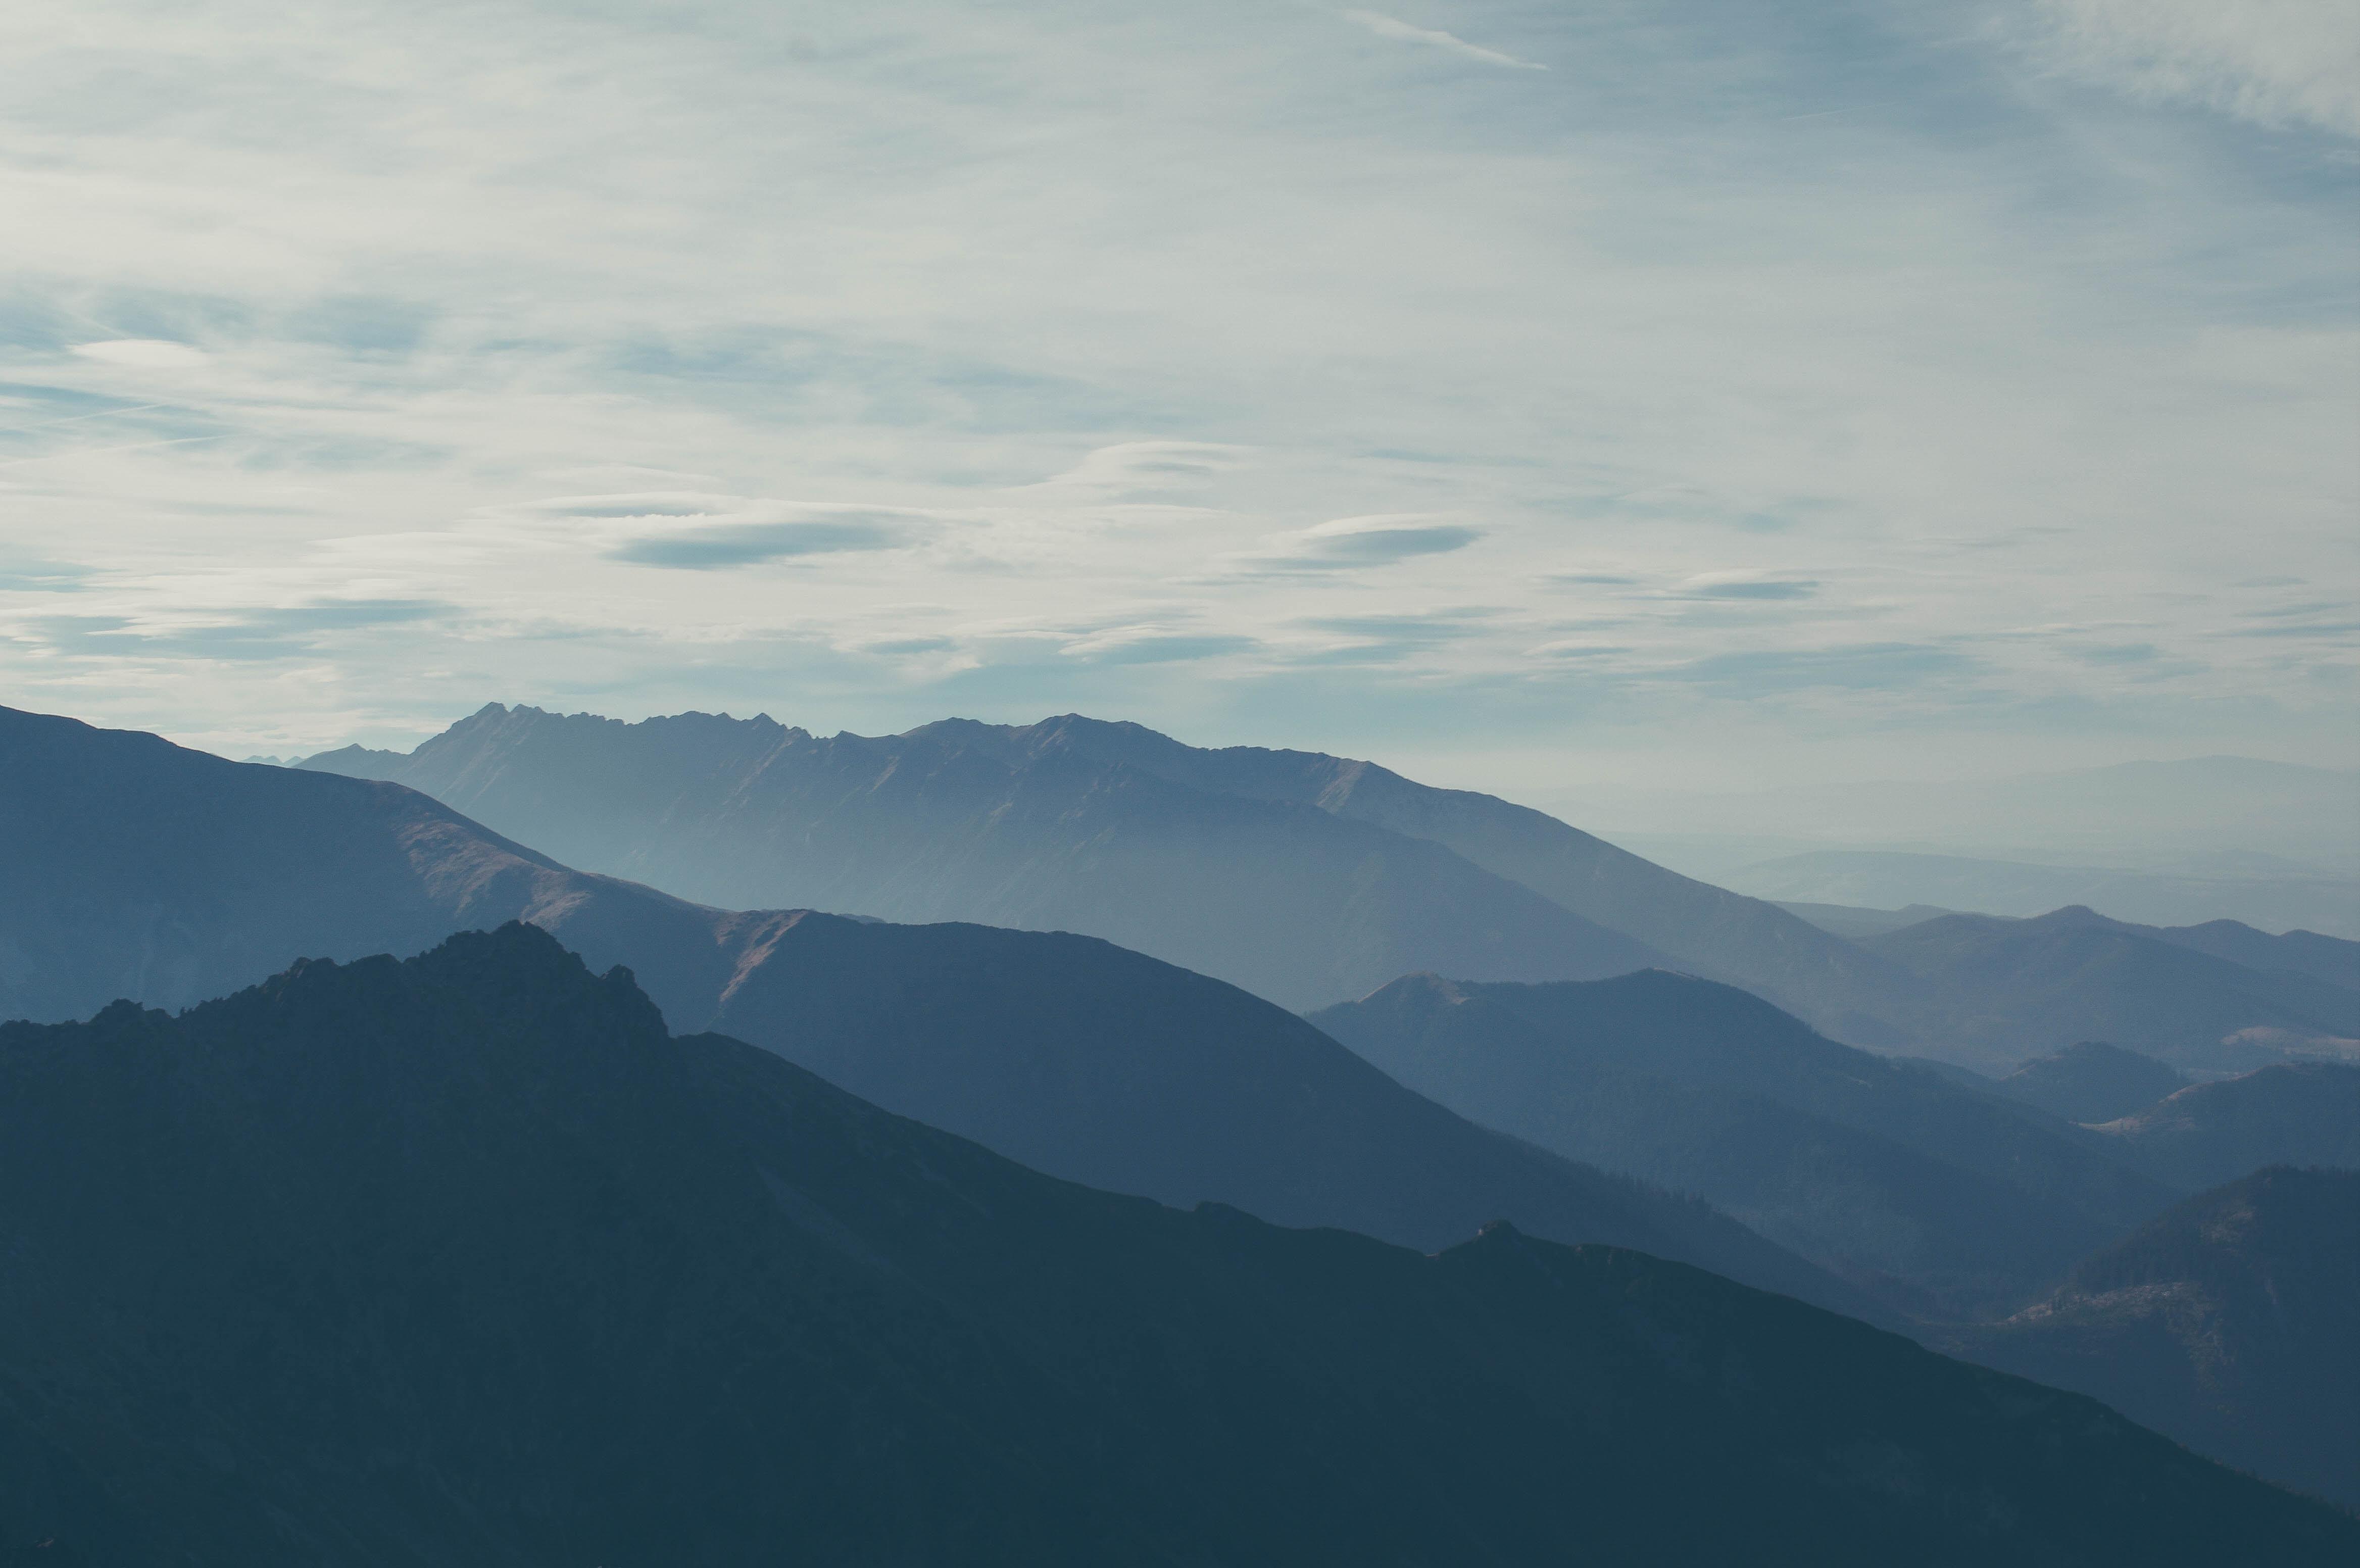 A hazy shot of several mountain ridges stretching to the horizon